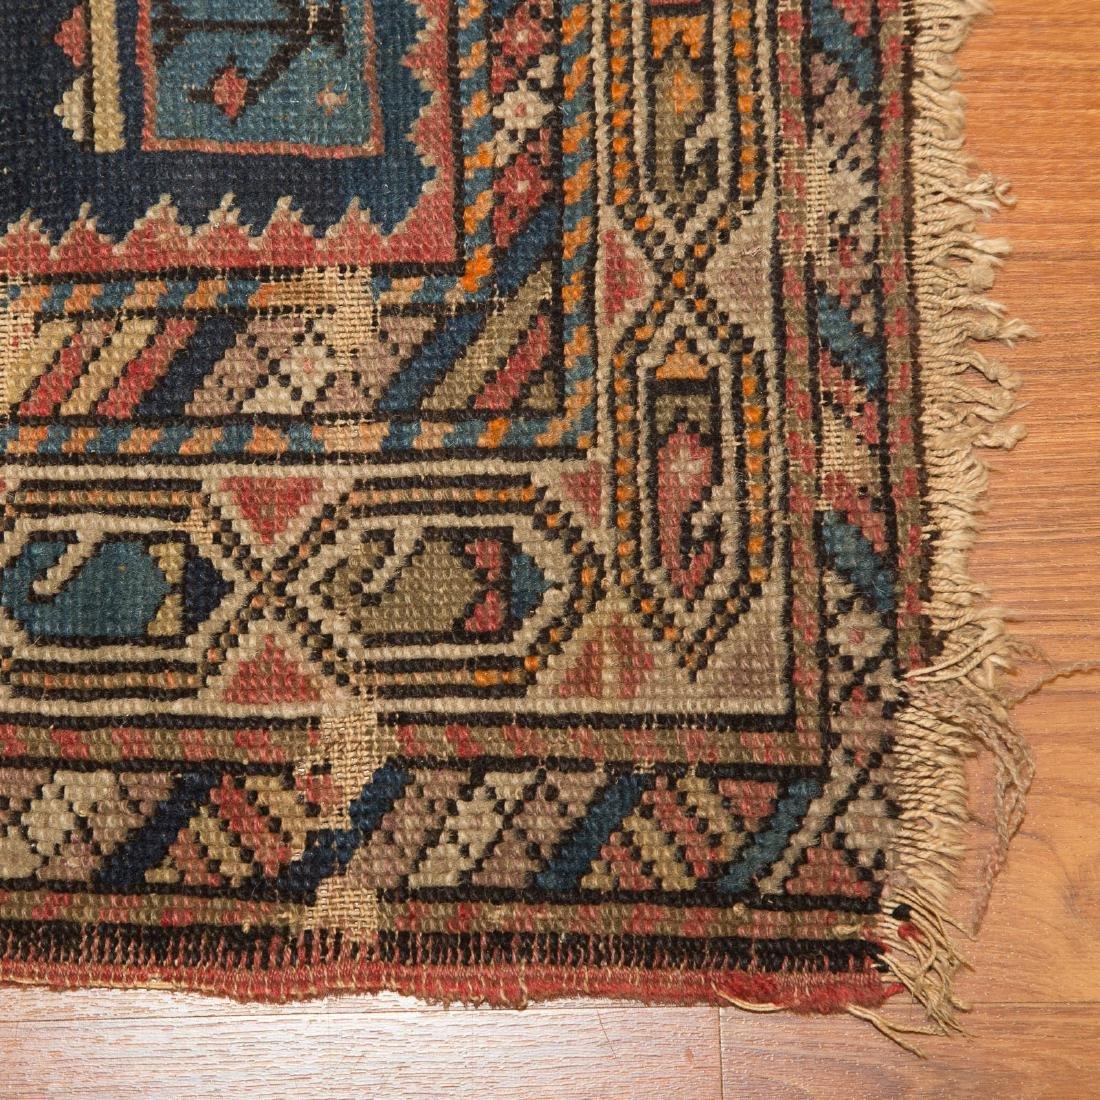 Antique Shirvan rug, approx. 3.5 x 5.3 - 2